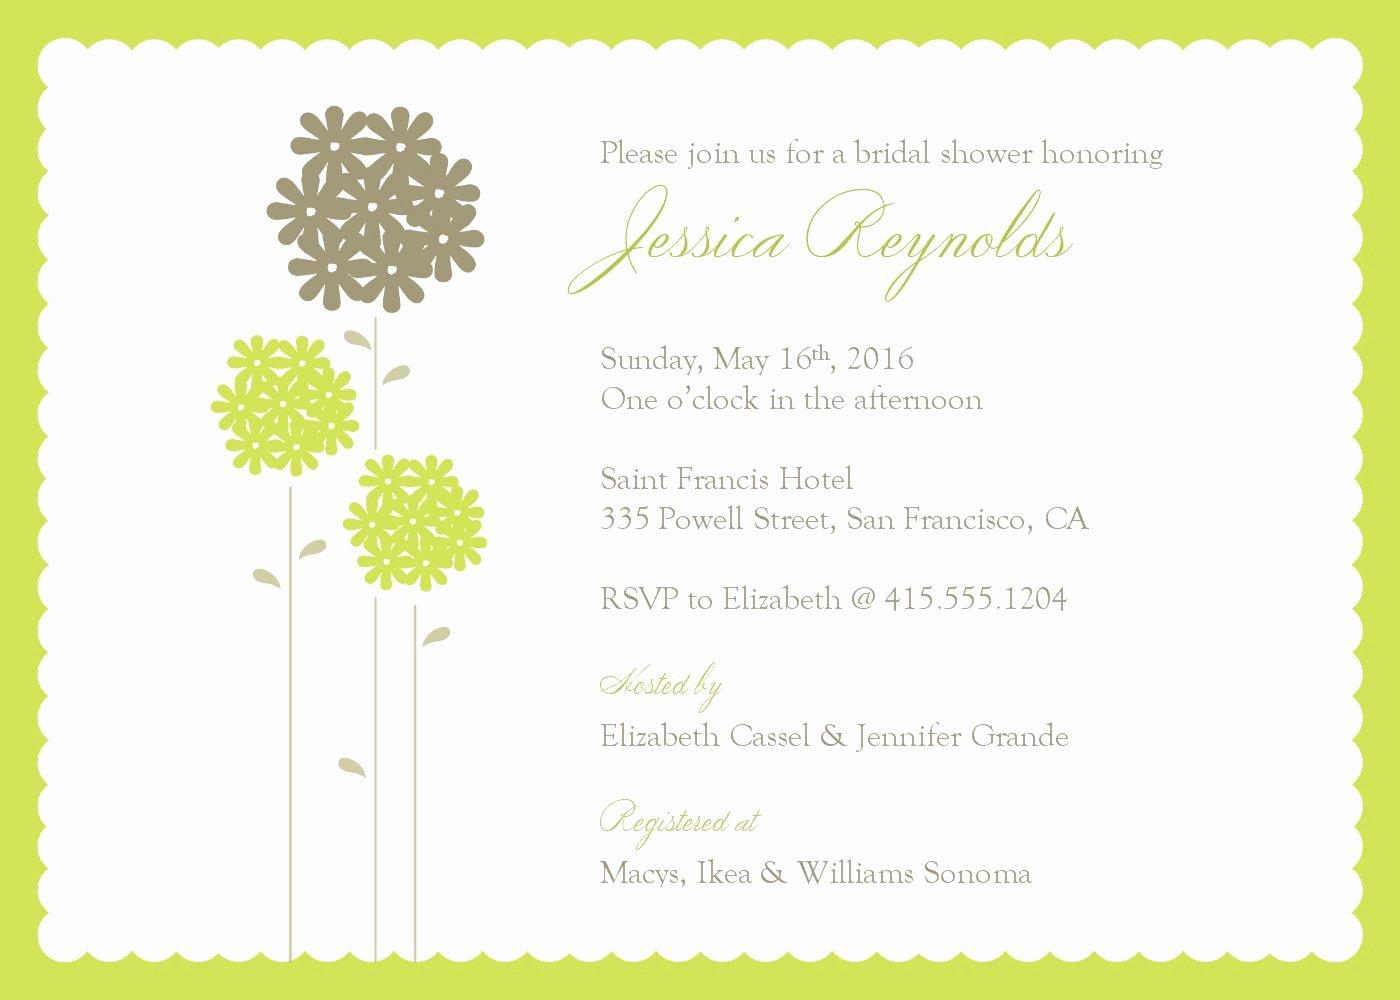 Bridal Shower Invite Template Best Of Bridal Shower Invitations Bridal Shower Invitations